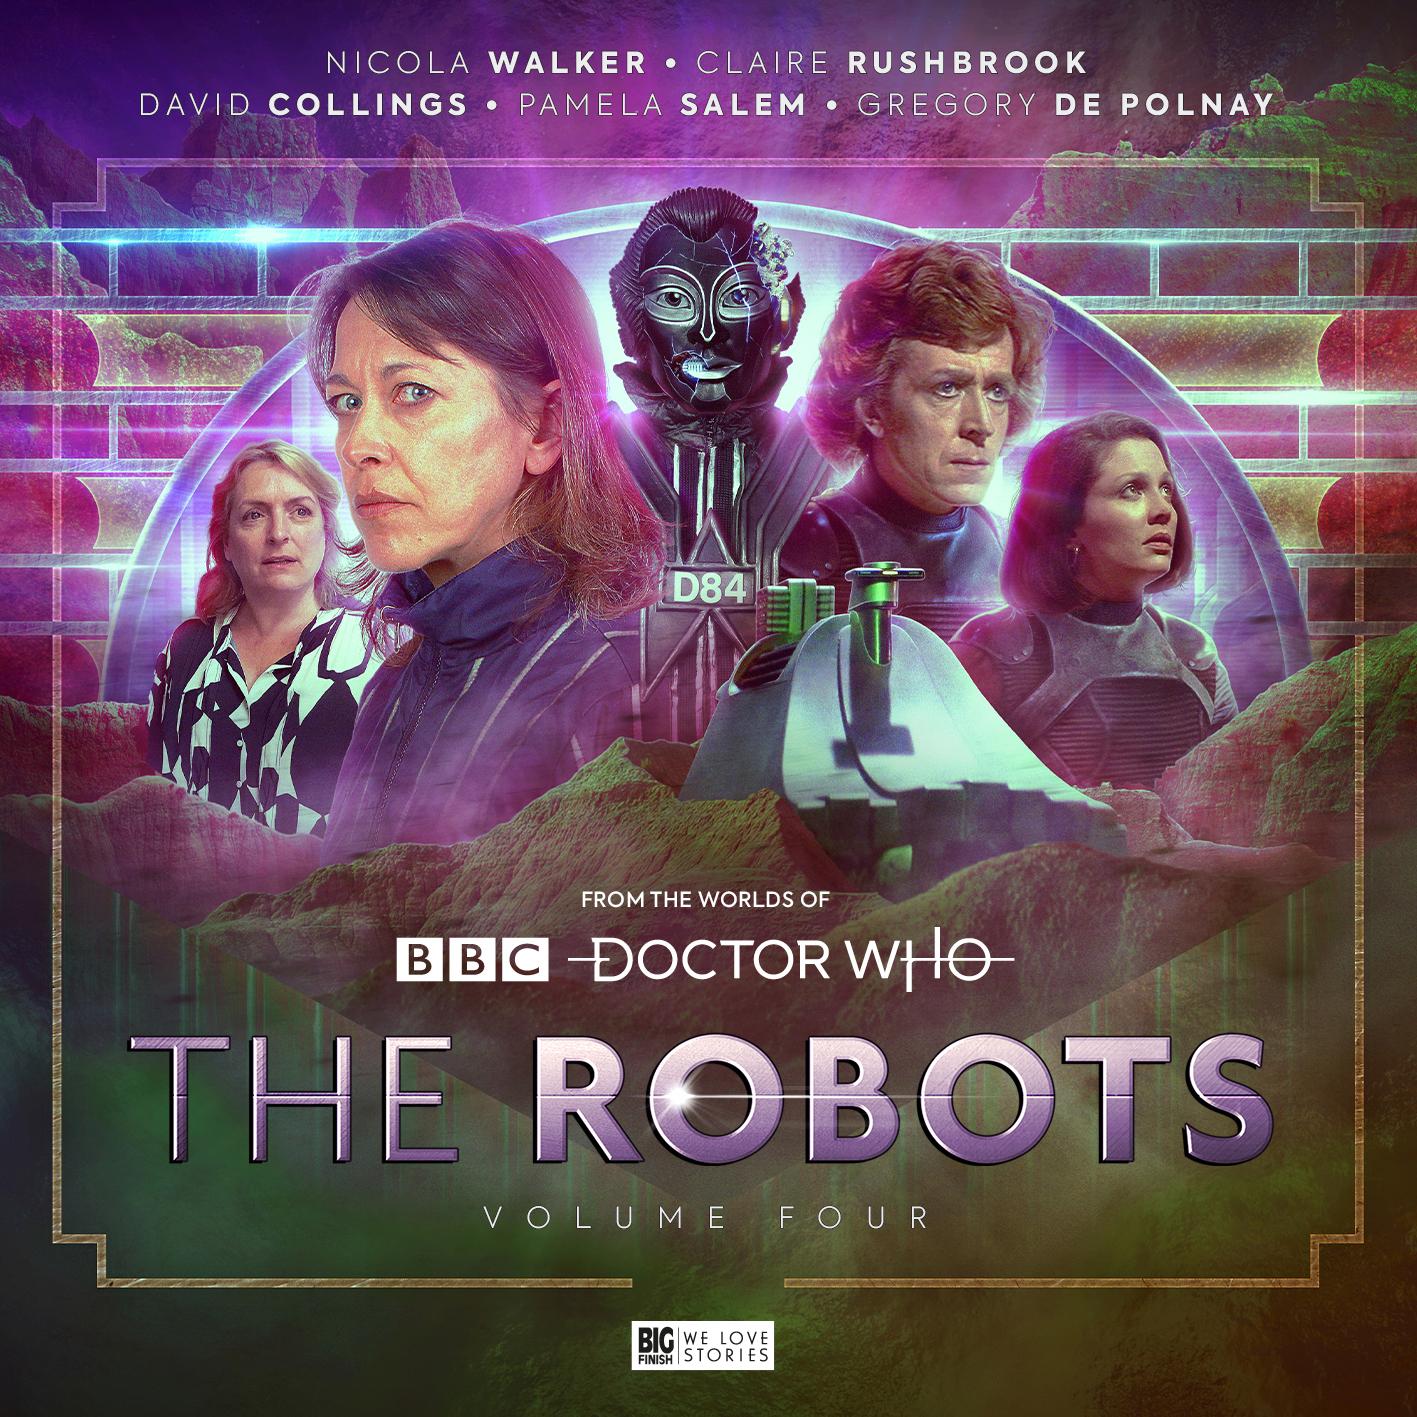 The Robots 4